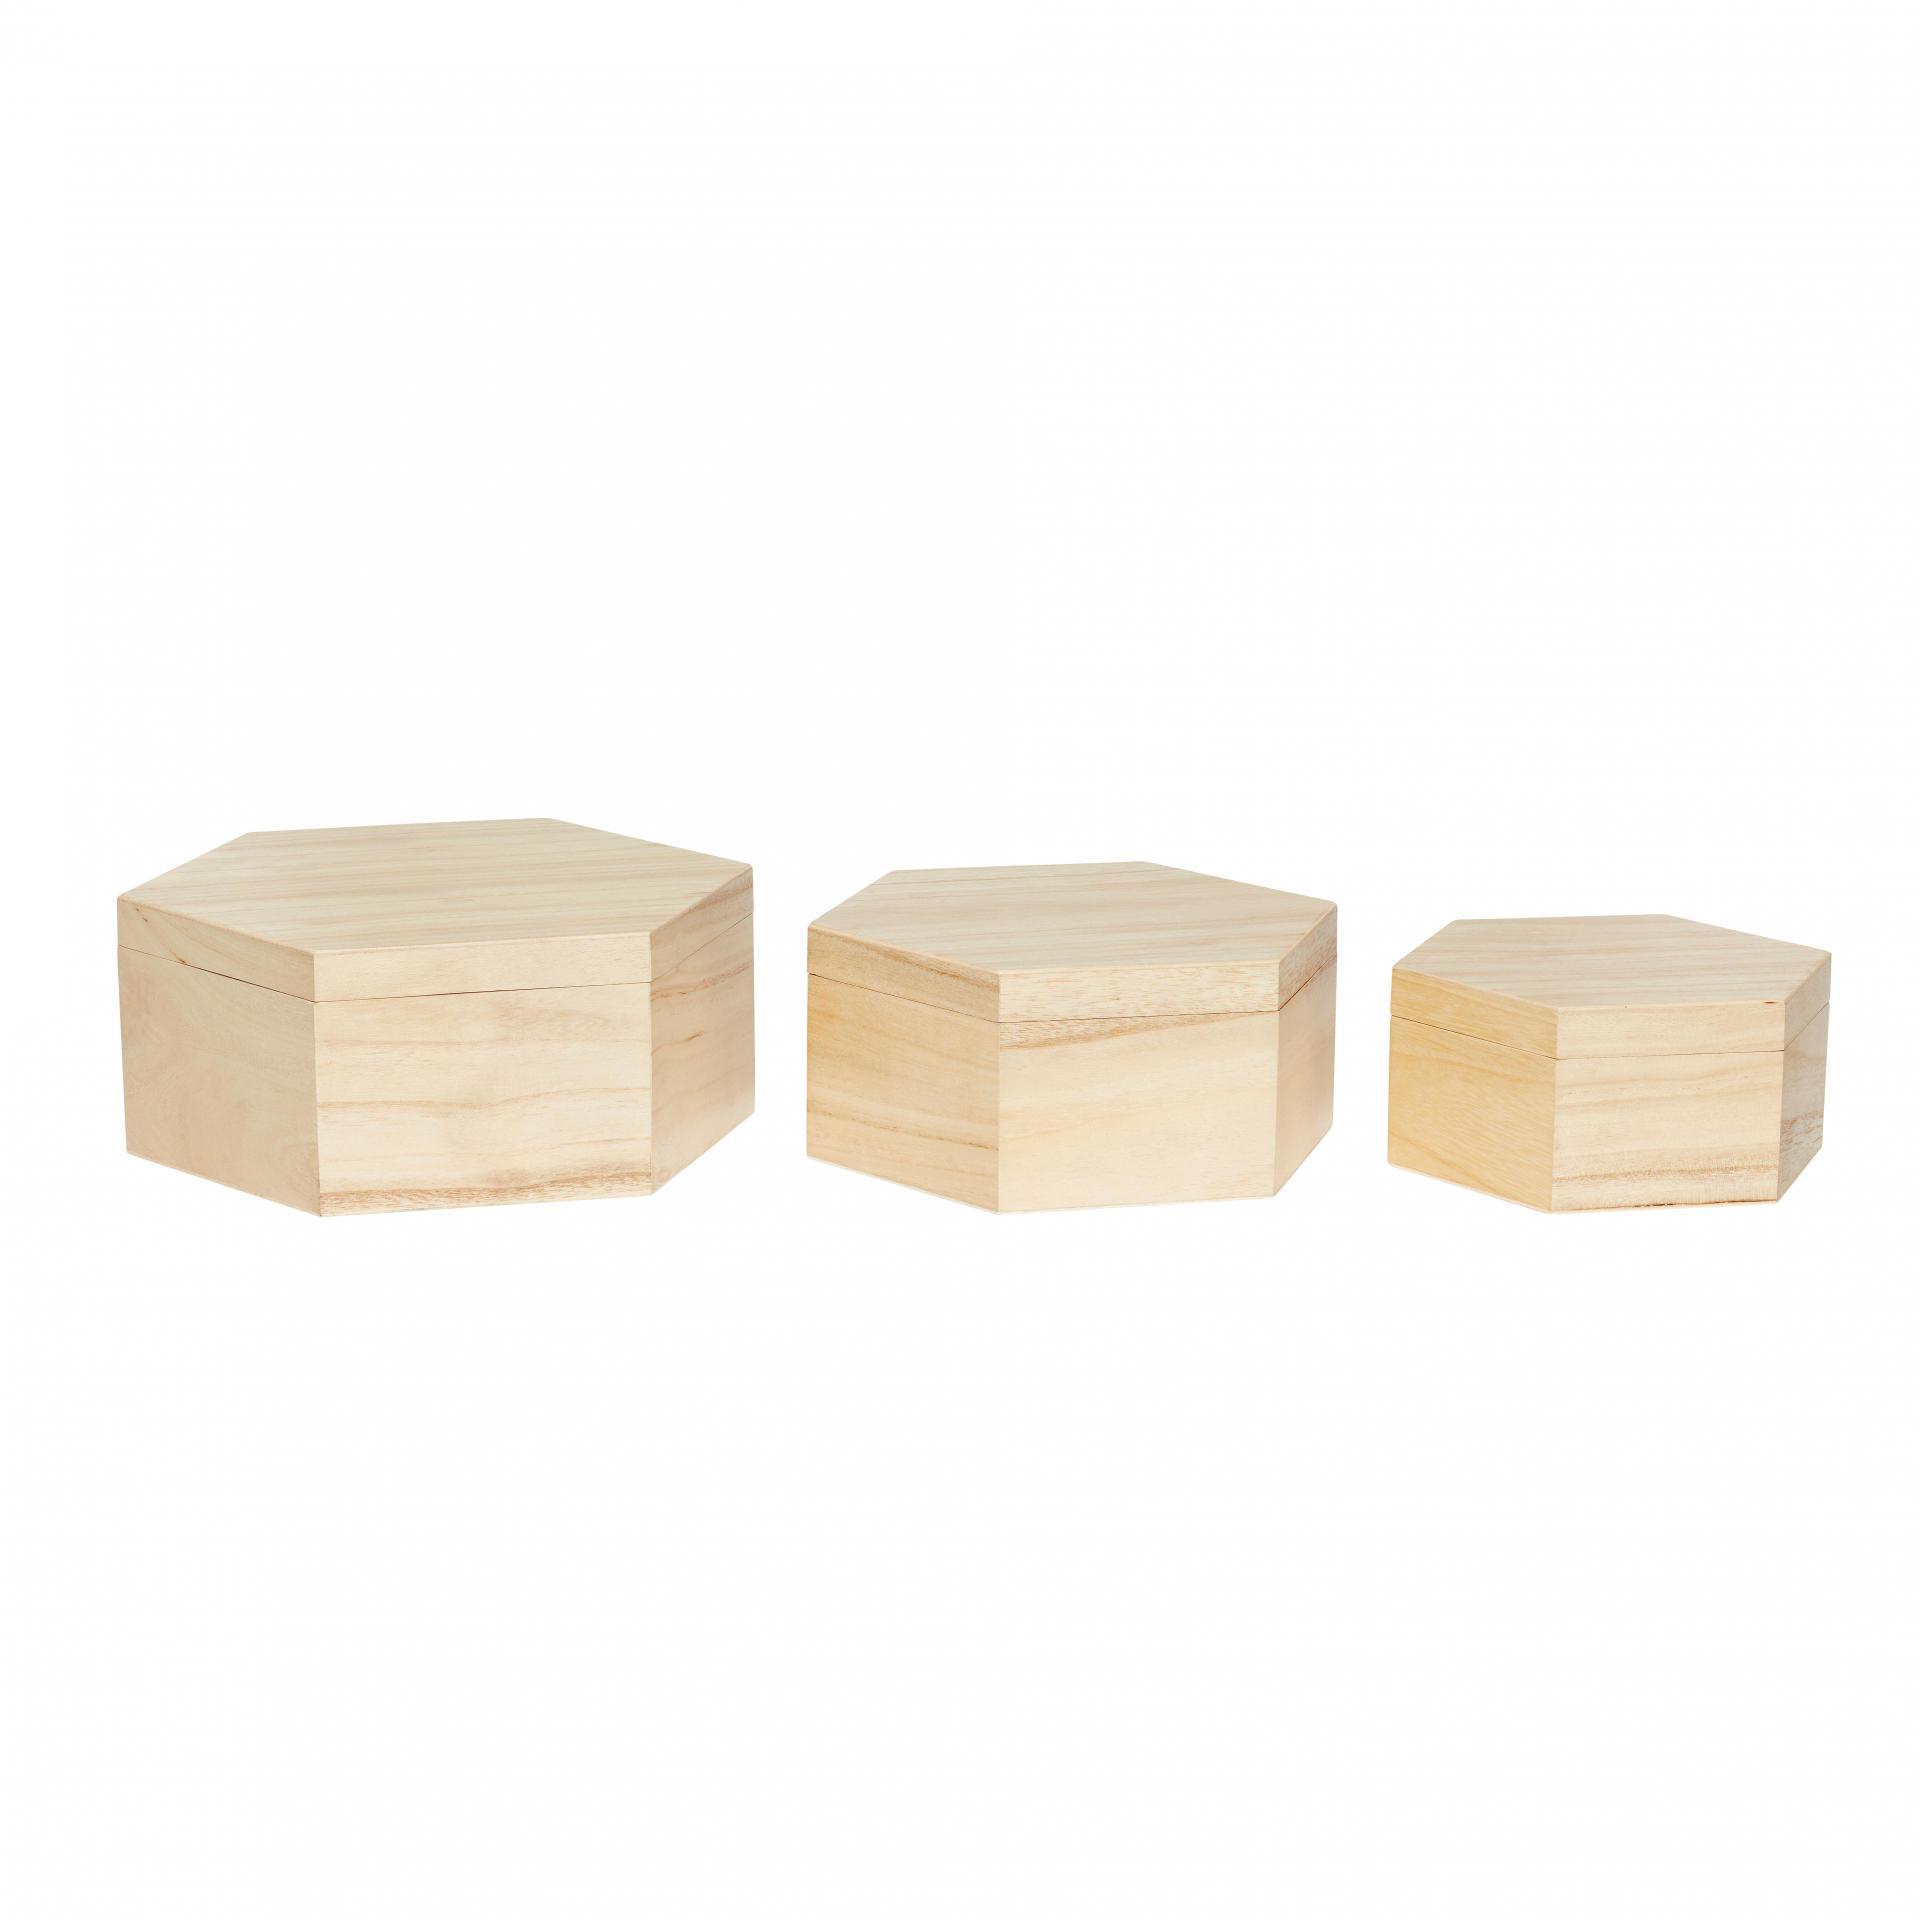 Hübsch Úložný box Hexagonal Velikost L, hnědá barva, dřevo